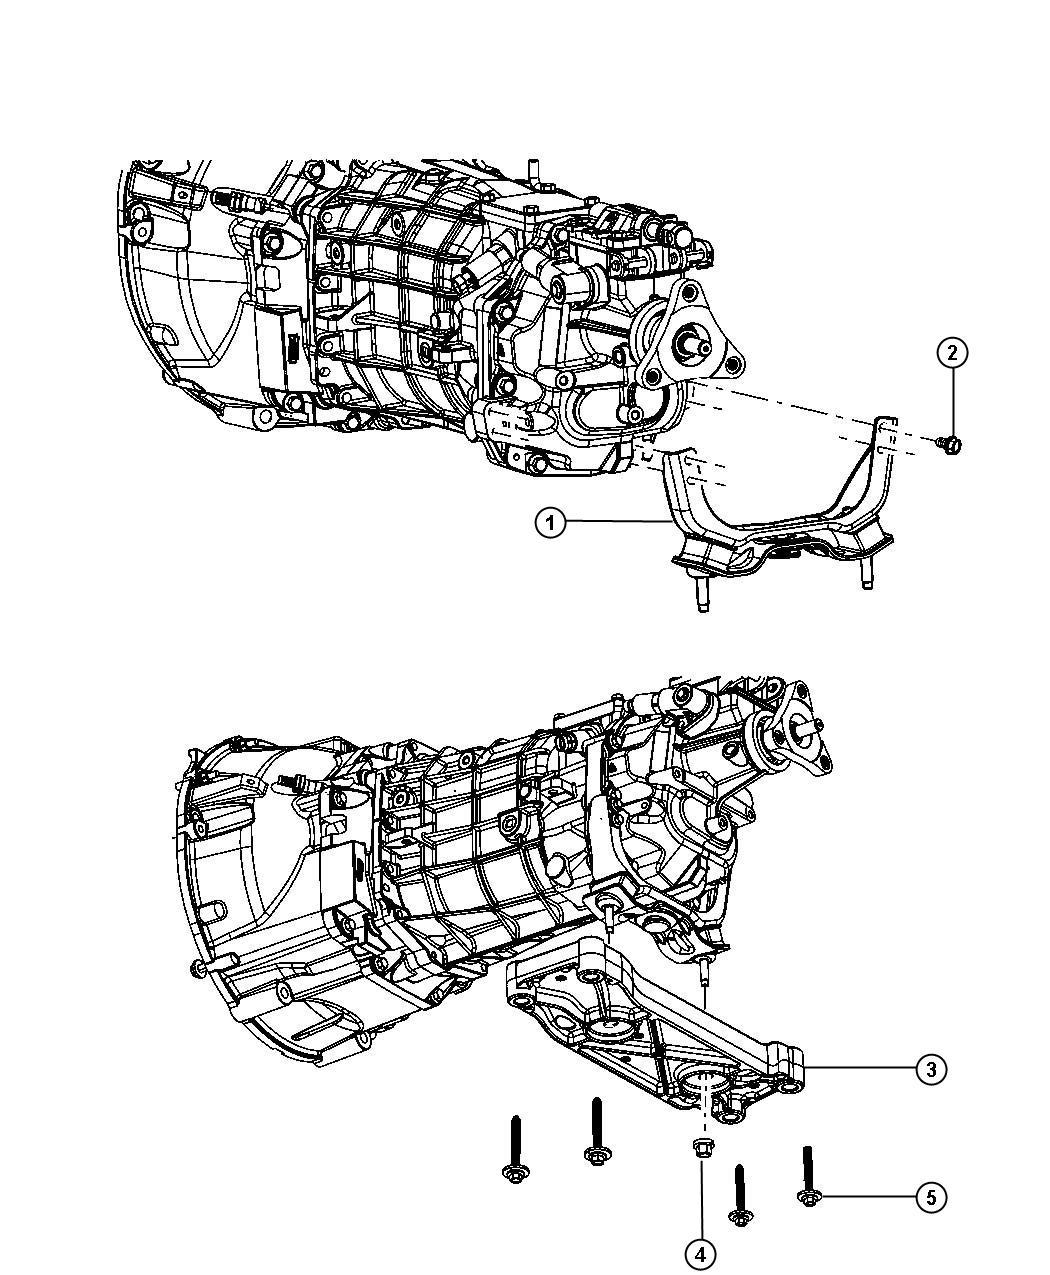 2016 Dodge Challenger Crossmember. Transmission